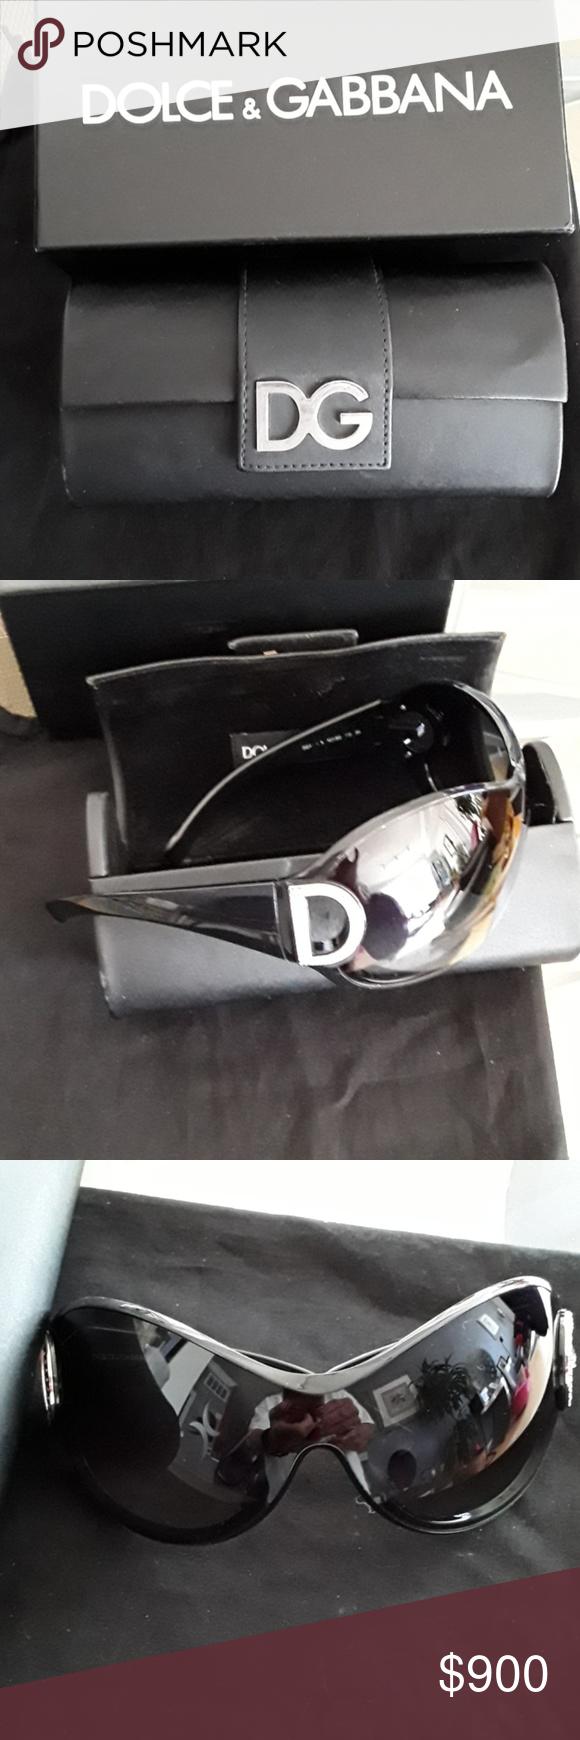 c01872b04a9c Sunglasses Authentic Dolce   Gabbana sunglasses Dolce   Gabbana Accessories  Glasses